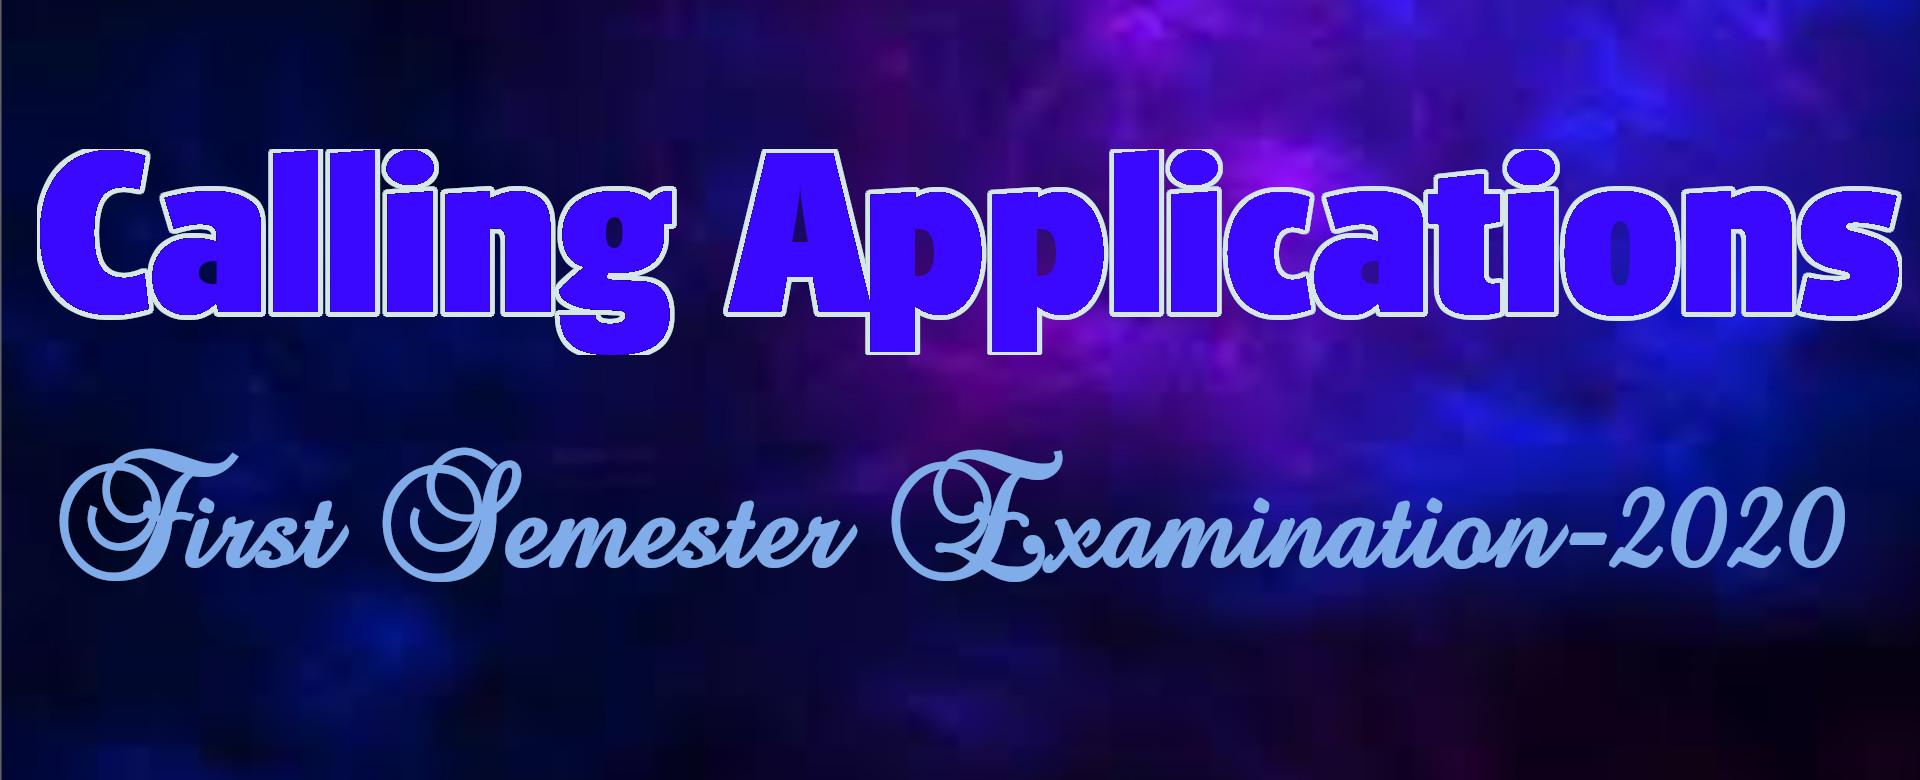 Calling Examination Applications -First Semester 2020